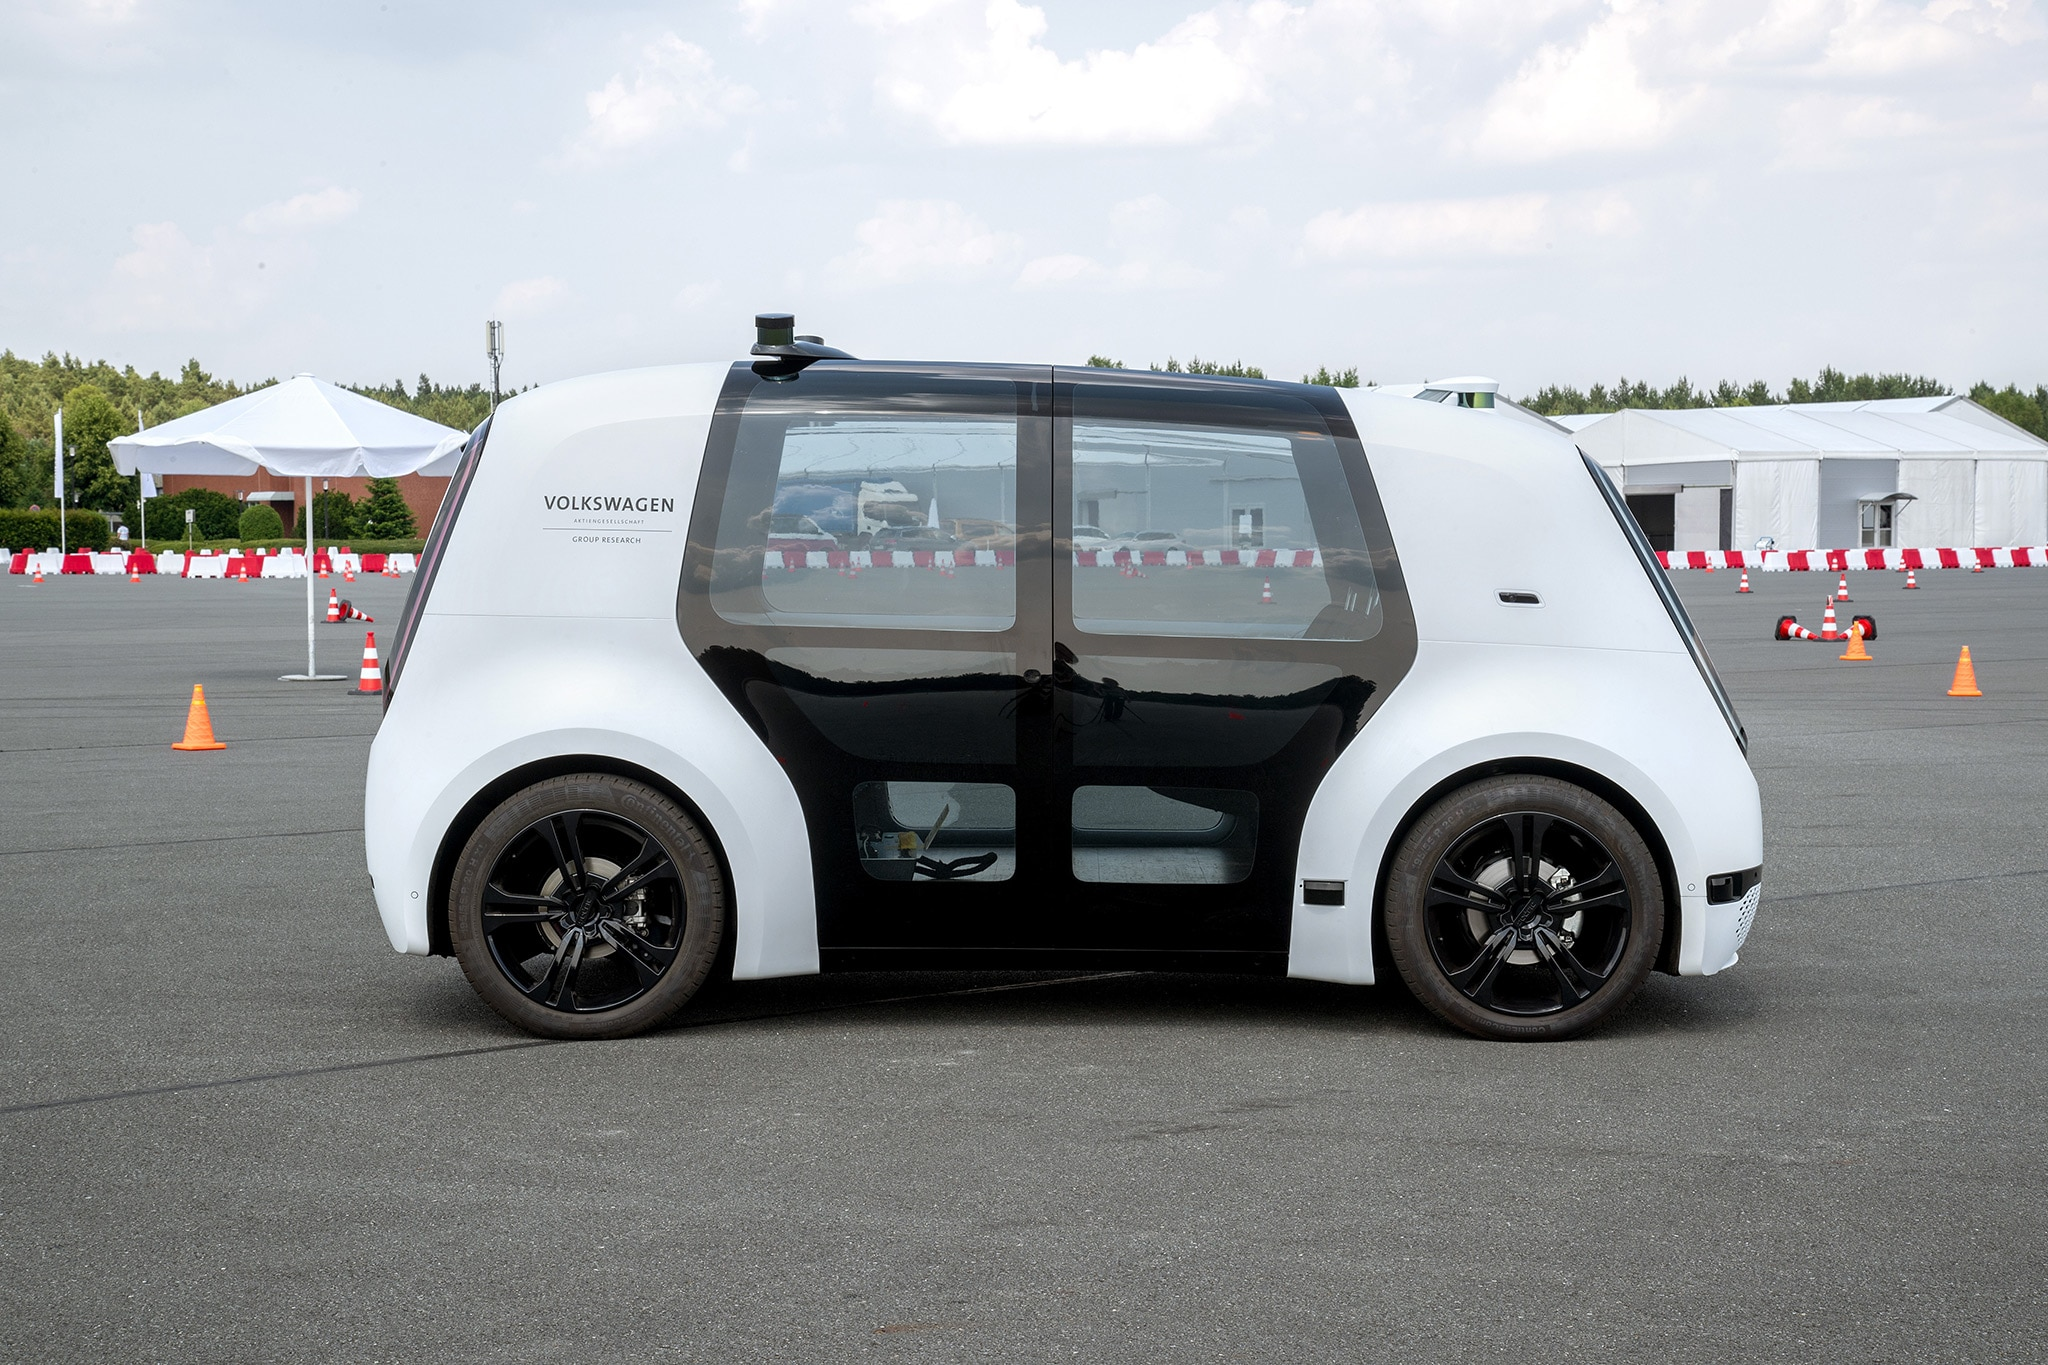 Volkswagen 2018 Future Mobility Day 01 Sedric